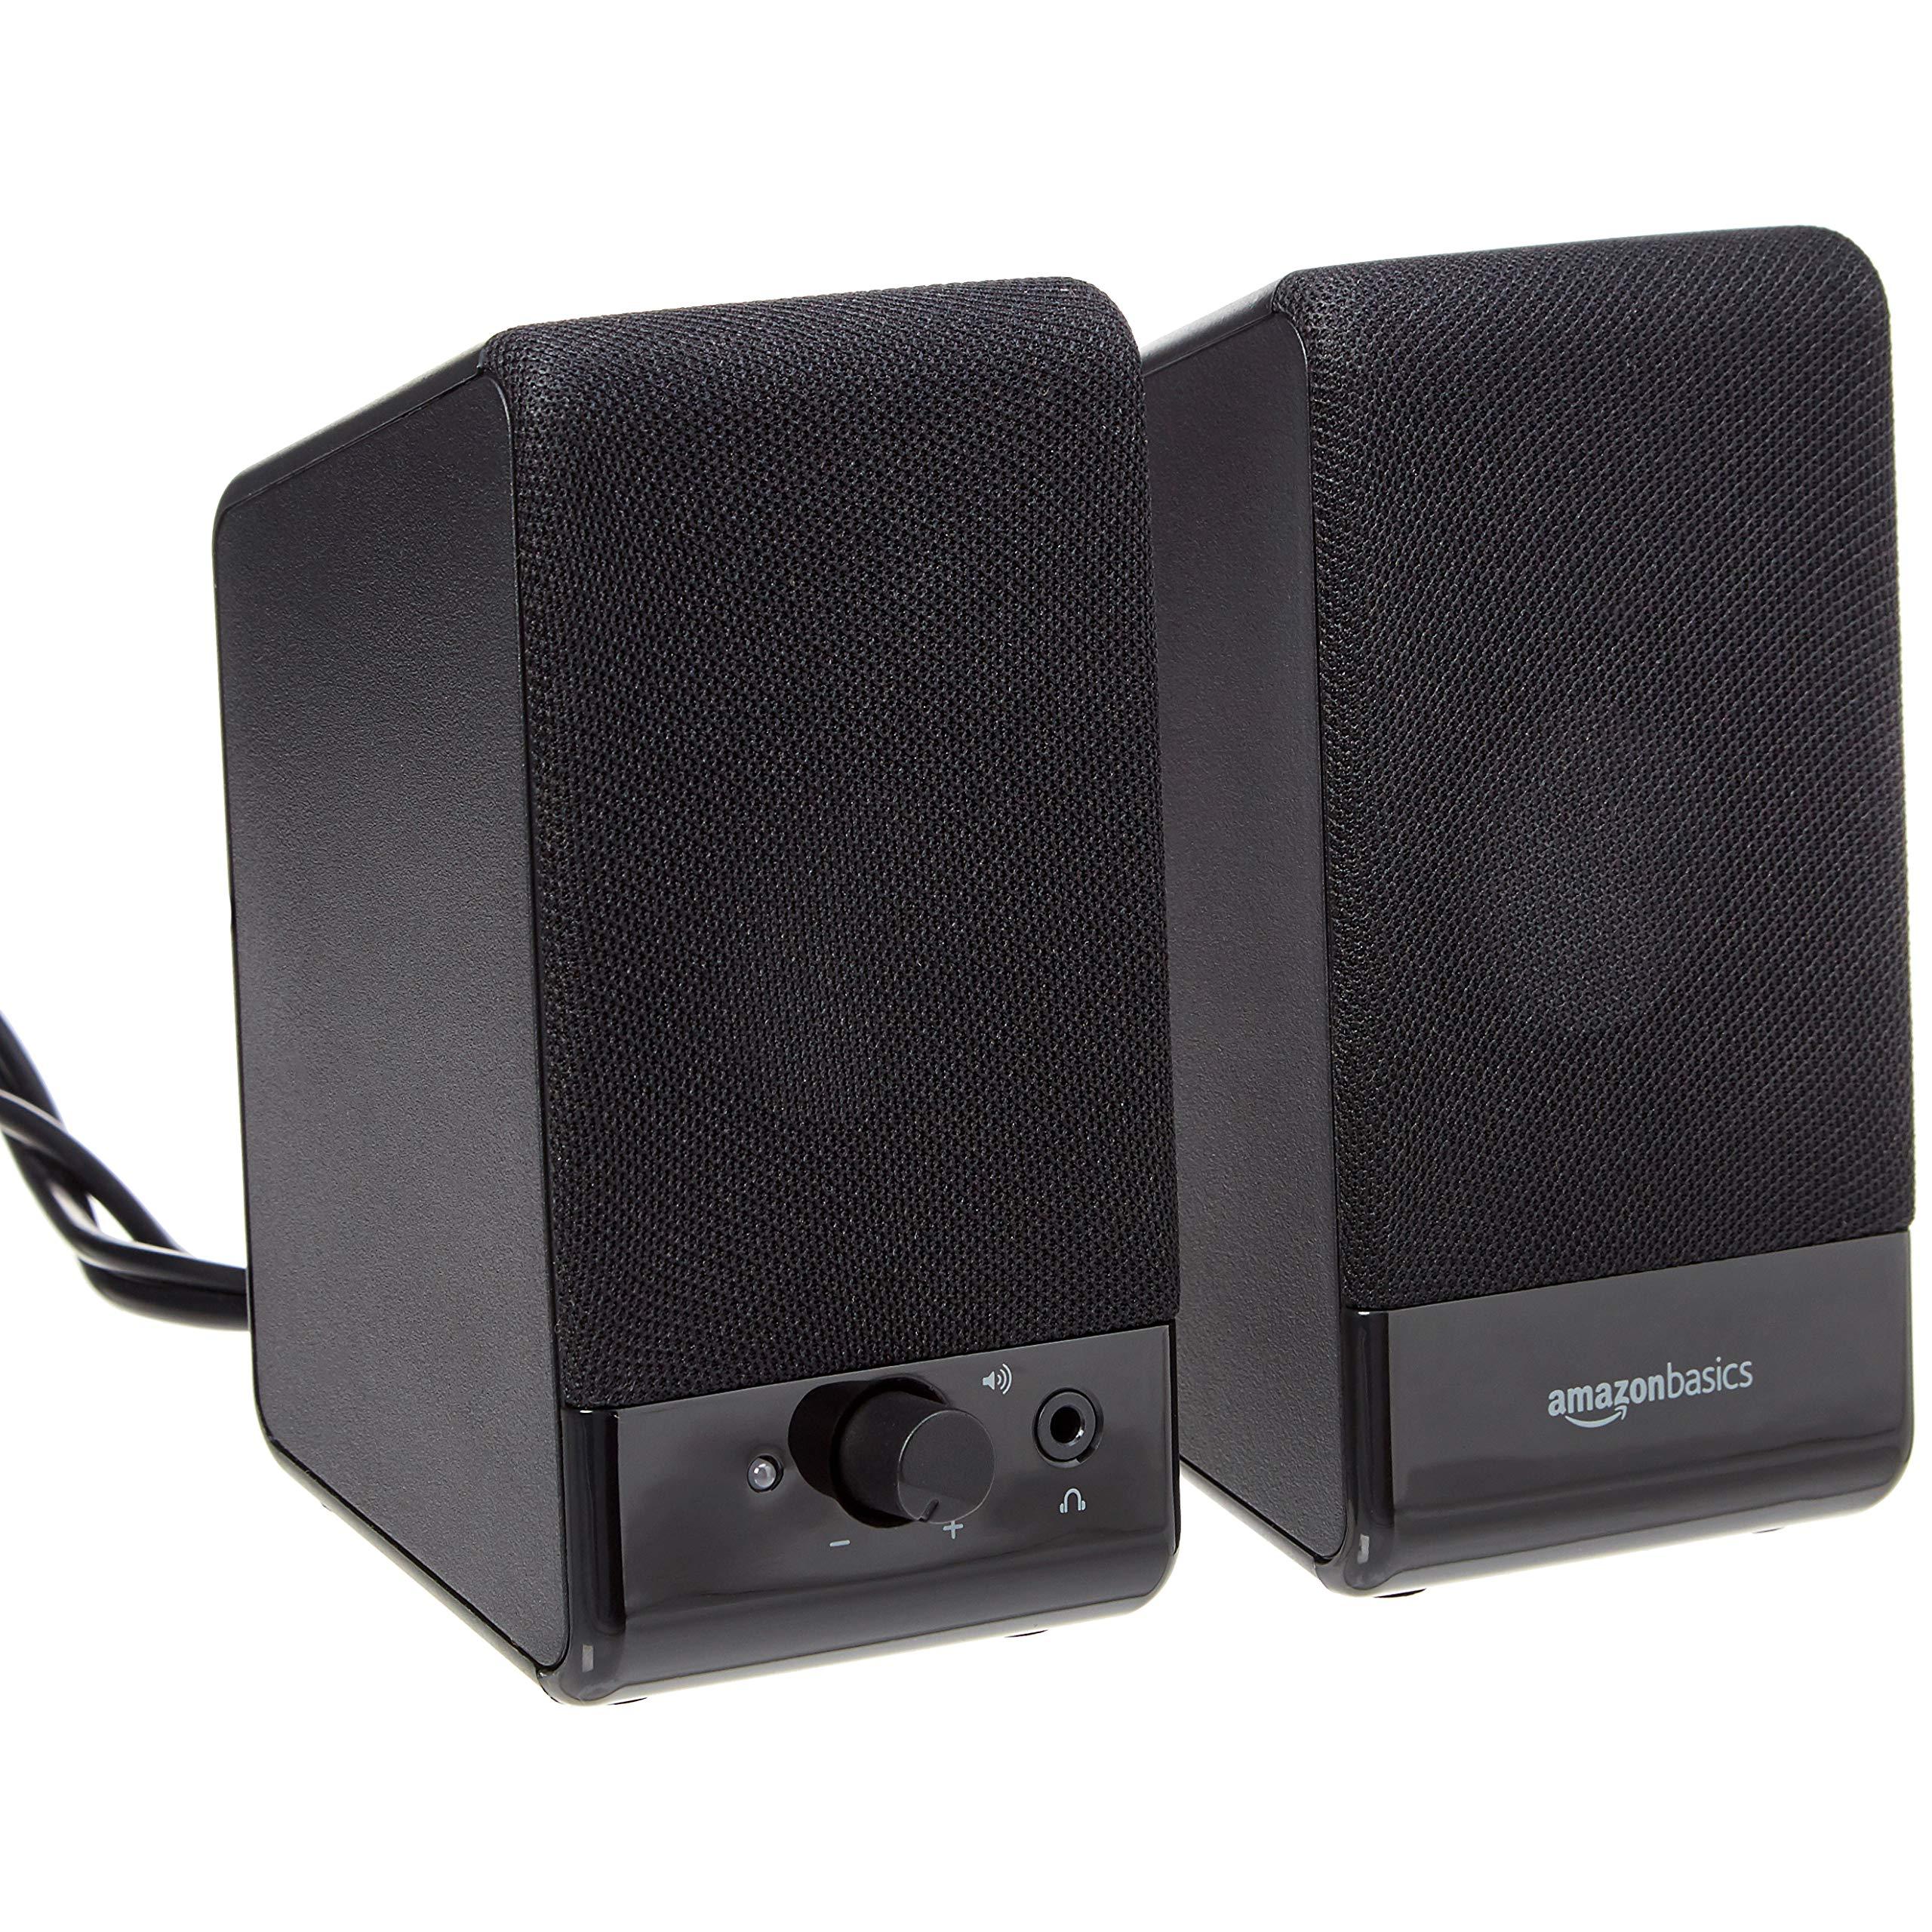 AmazonBasics Computer Speakers for Desktop or Laptop PC | USB-Powered by AmazonBasics